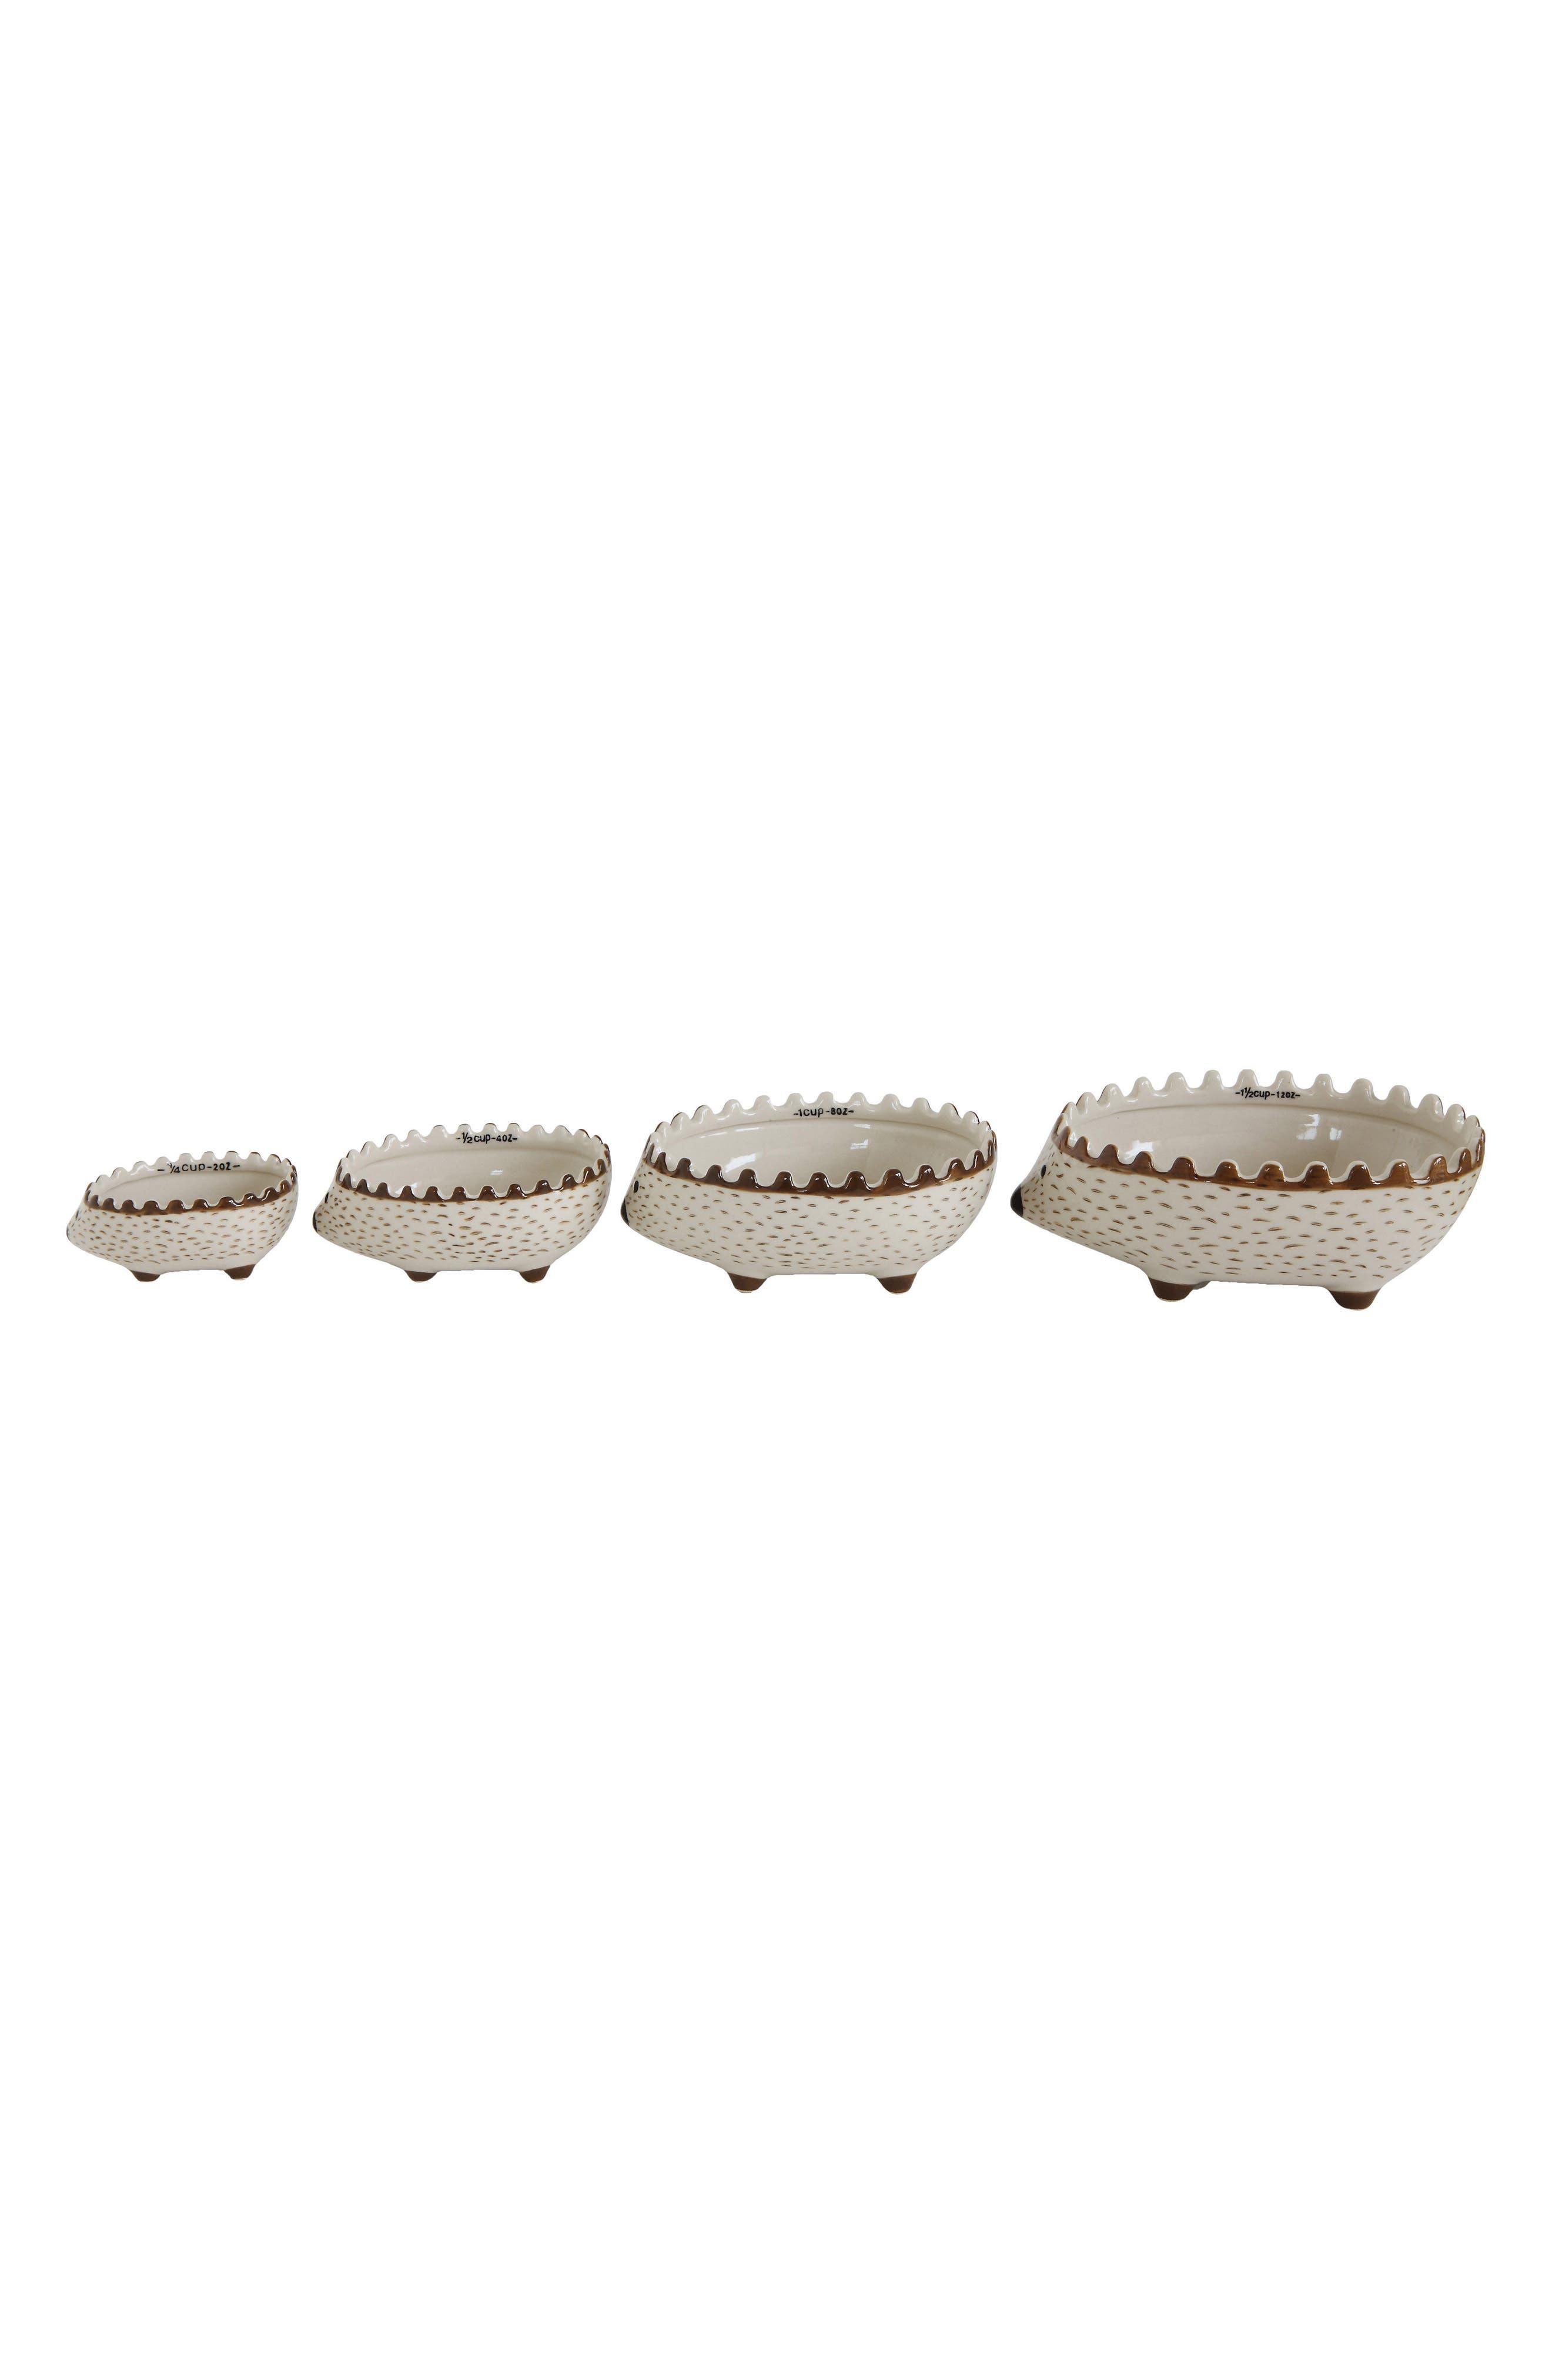 Creative Co-Op Set of 4 Hedgehog Measuring Cups